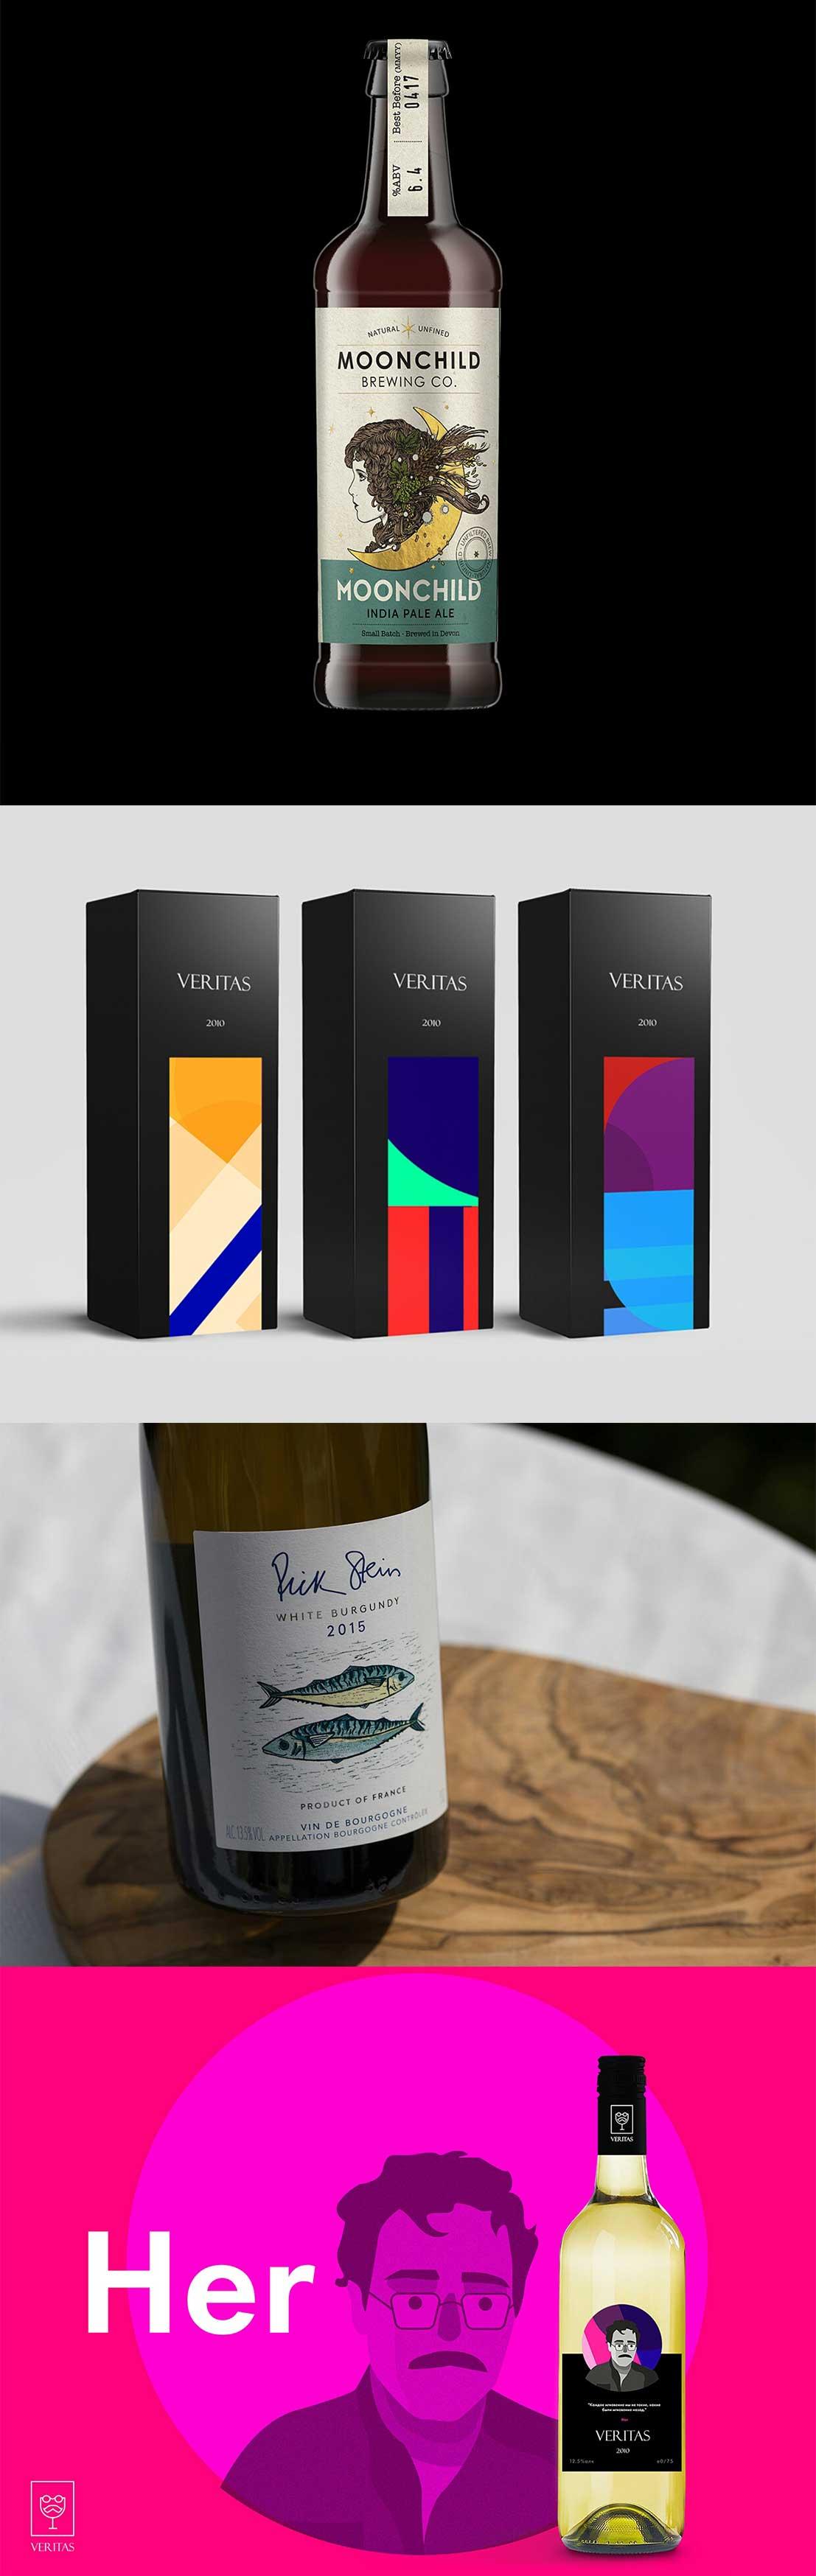 дизайн бутылки вина